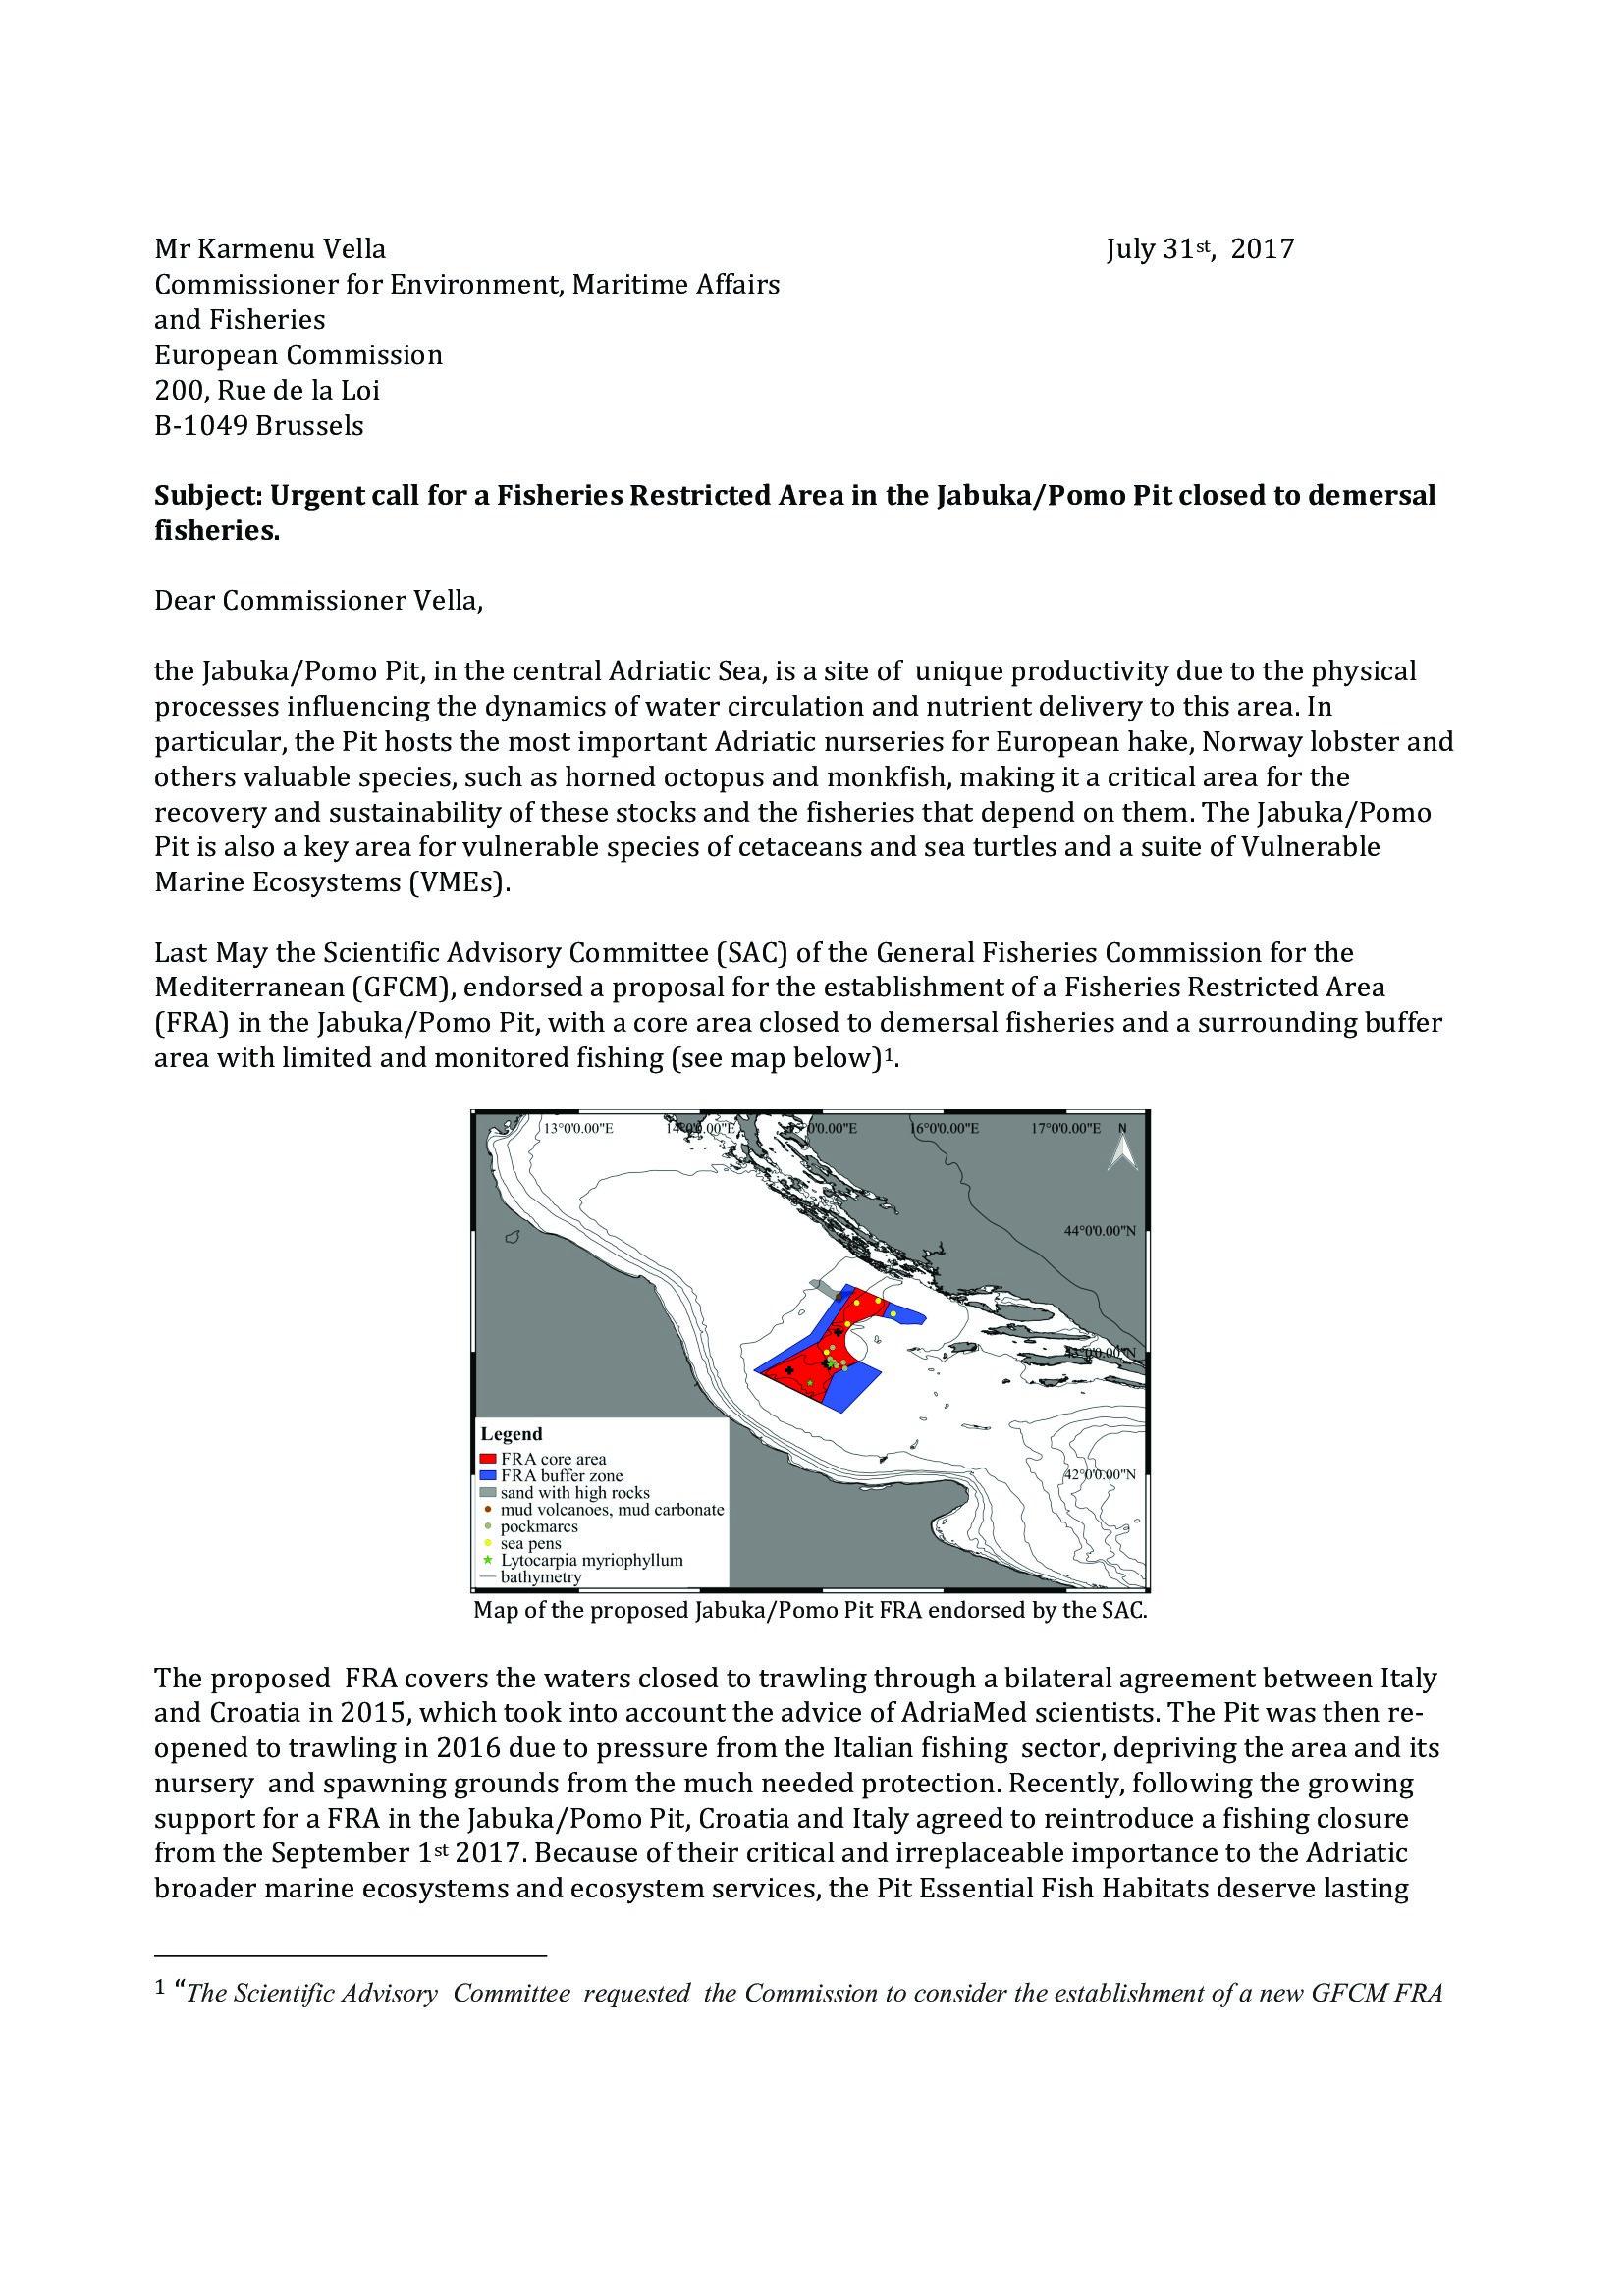 FRA Karmenu Vella Letter